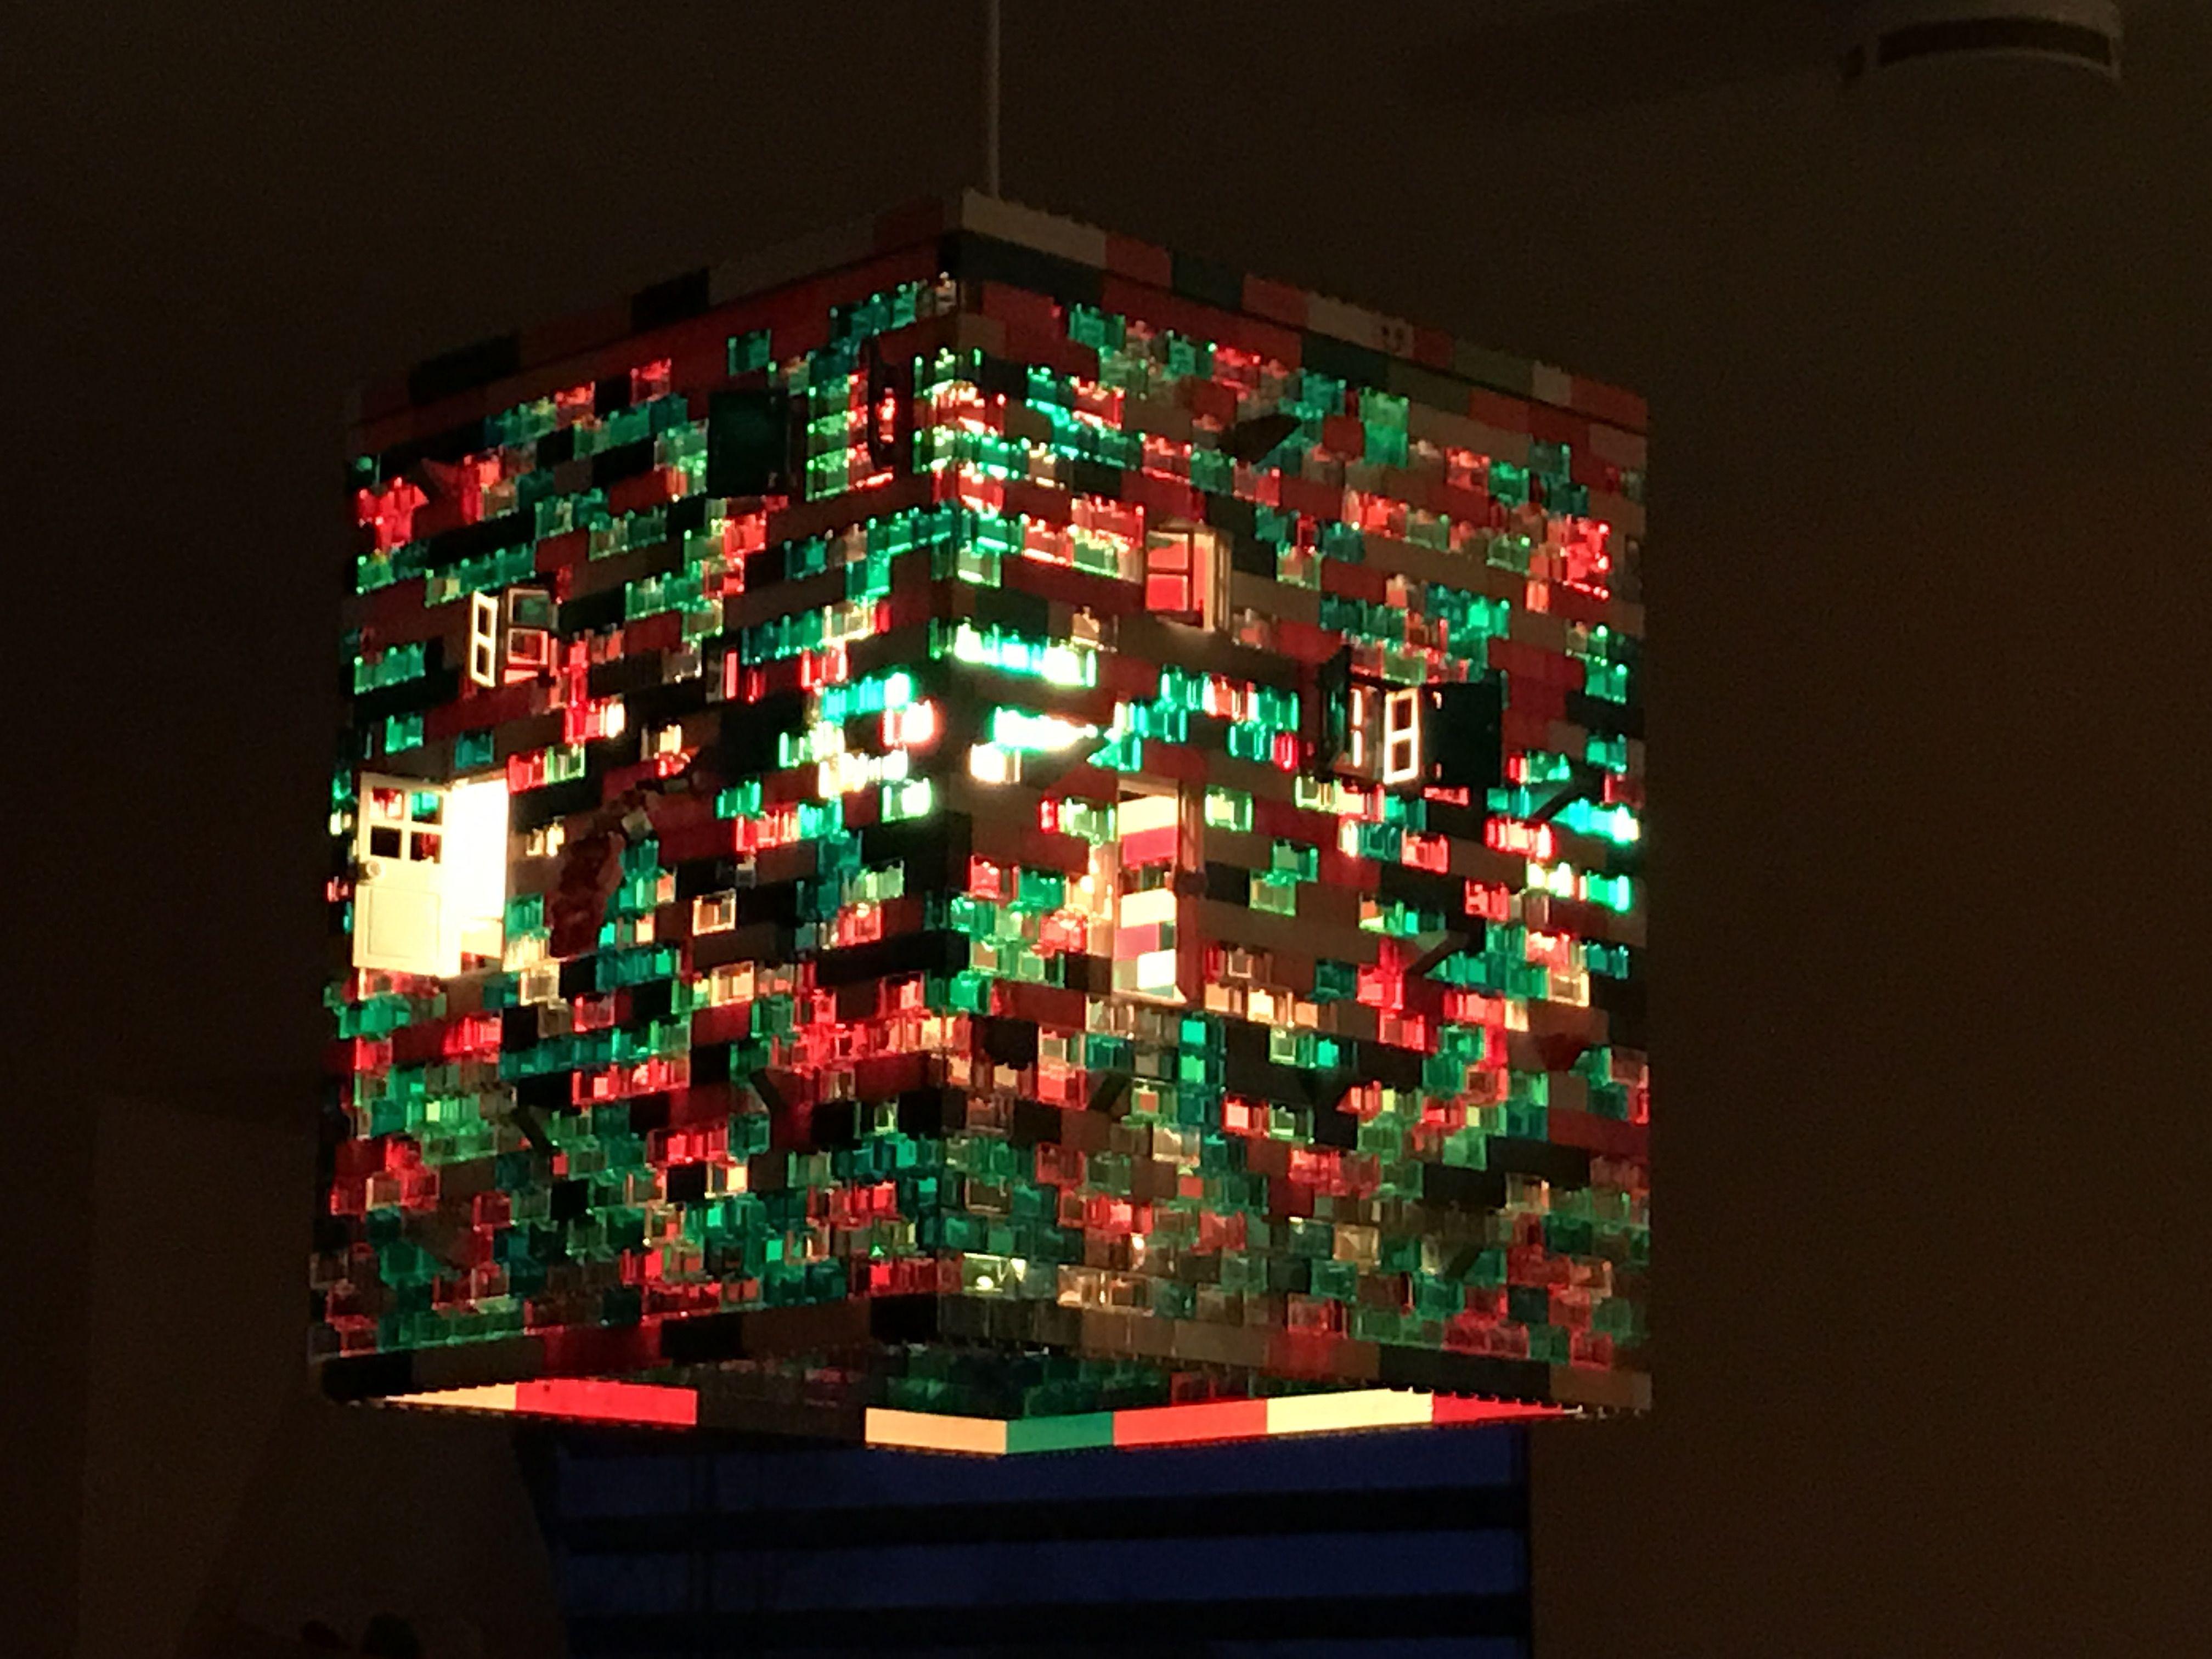 das neue kinderzimmer-highlight lego leuchte lego lampe | lego